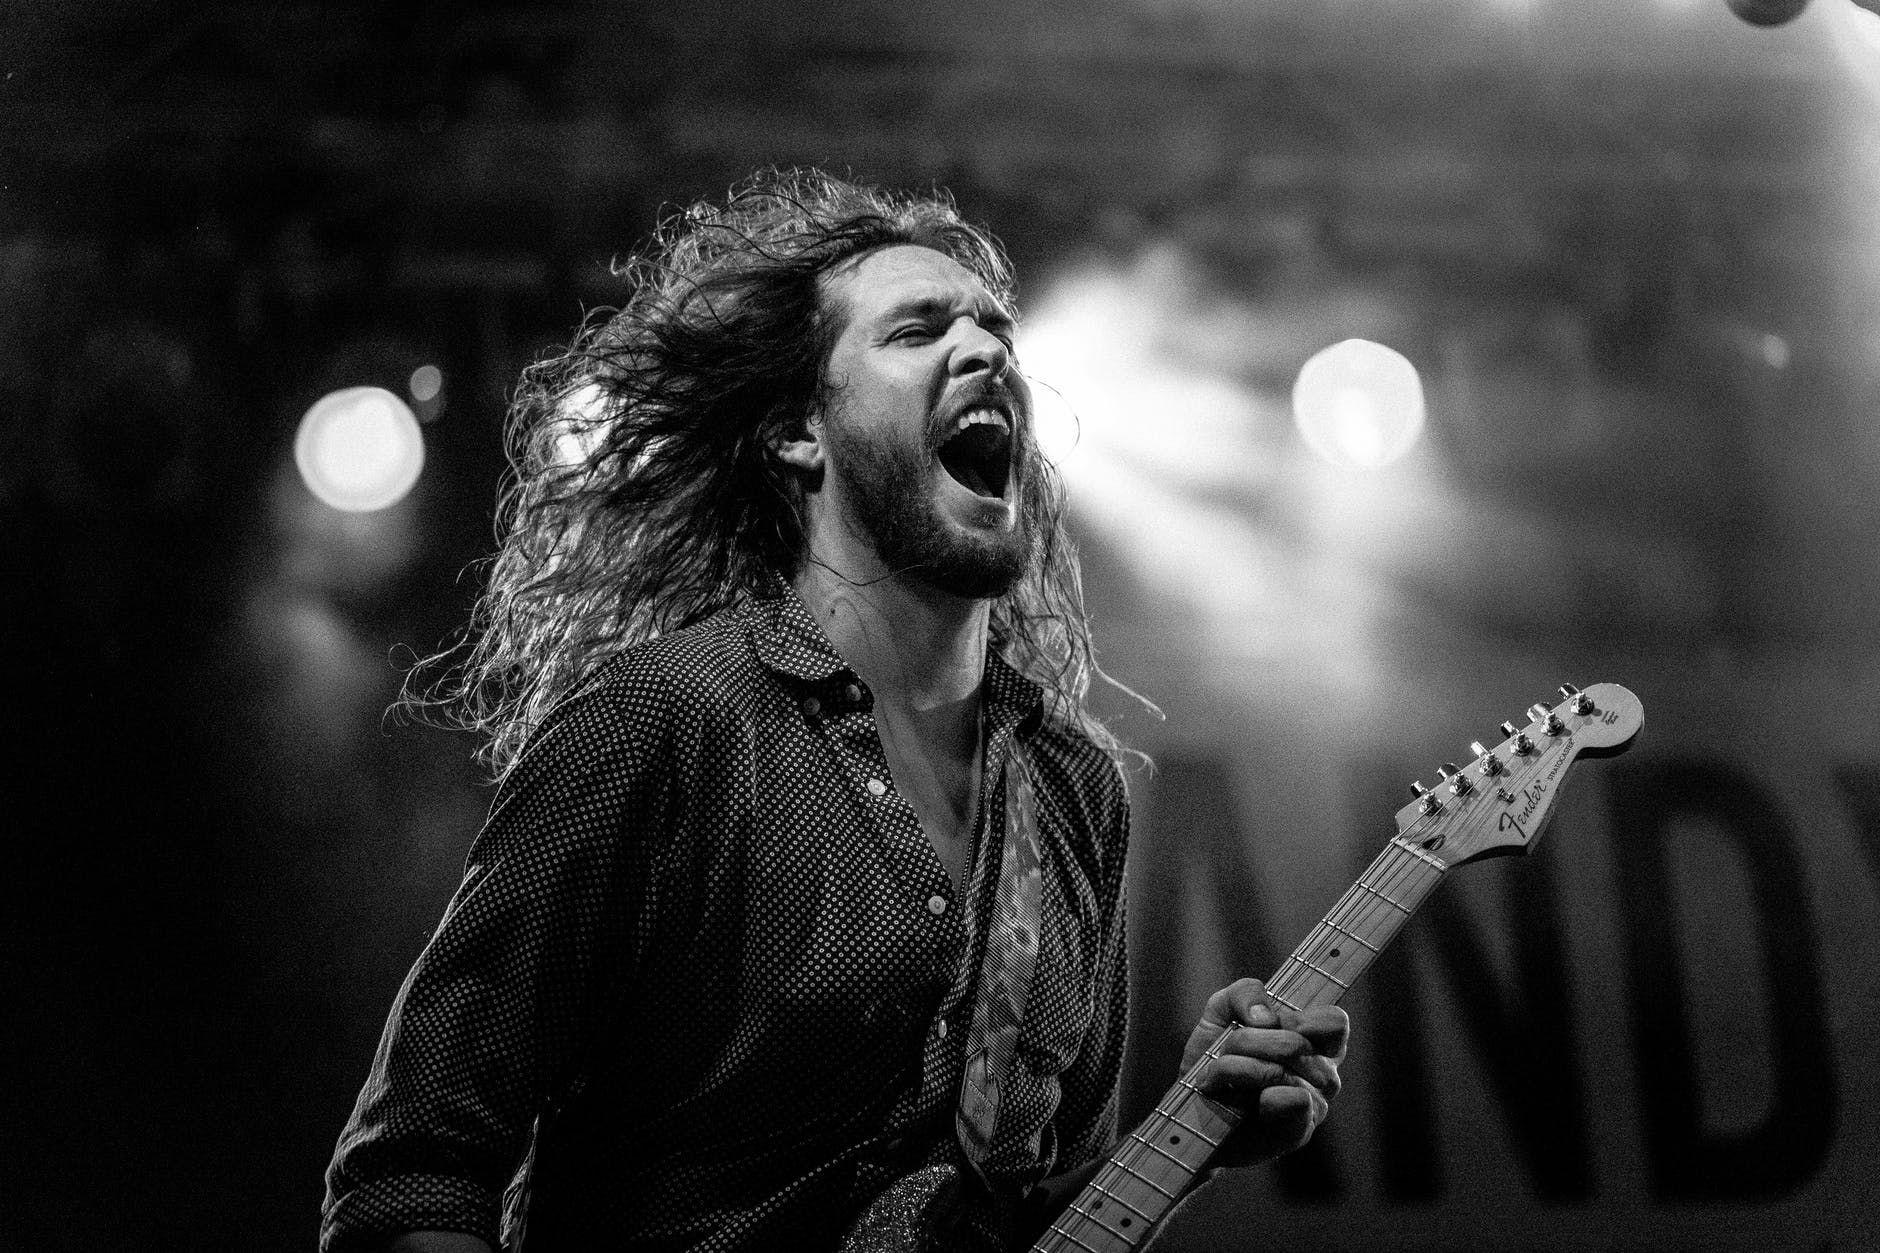 Guitarrista de cabelo grande faz solo de rock